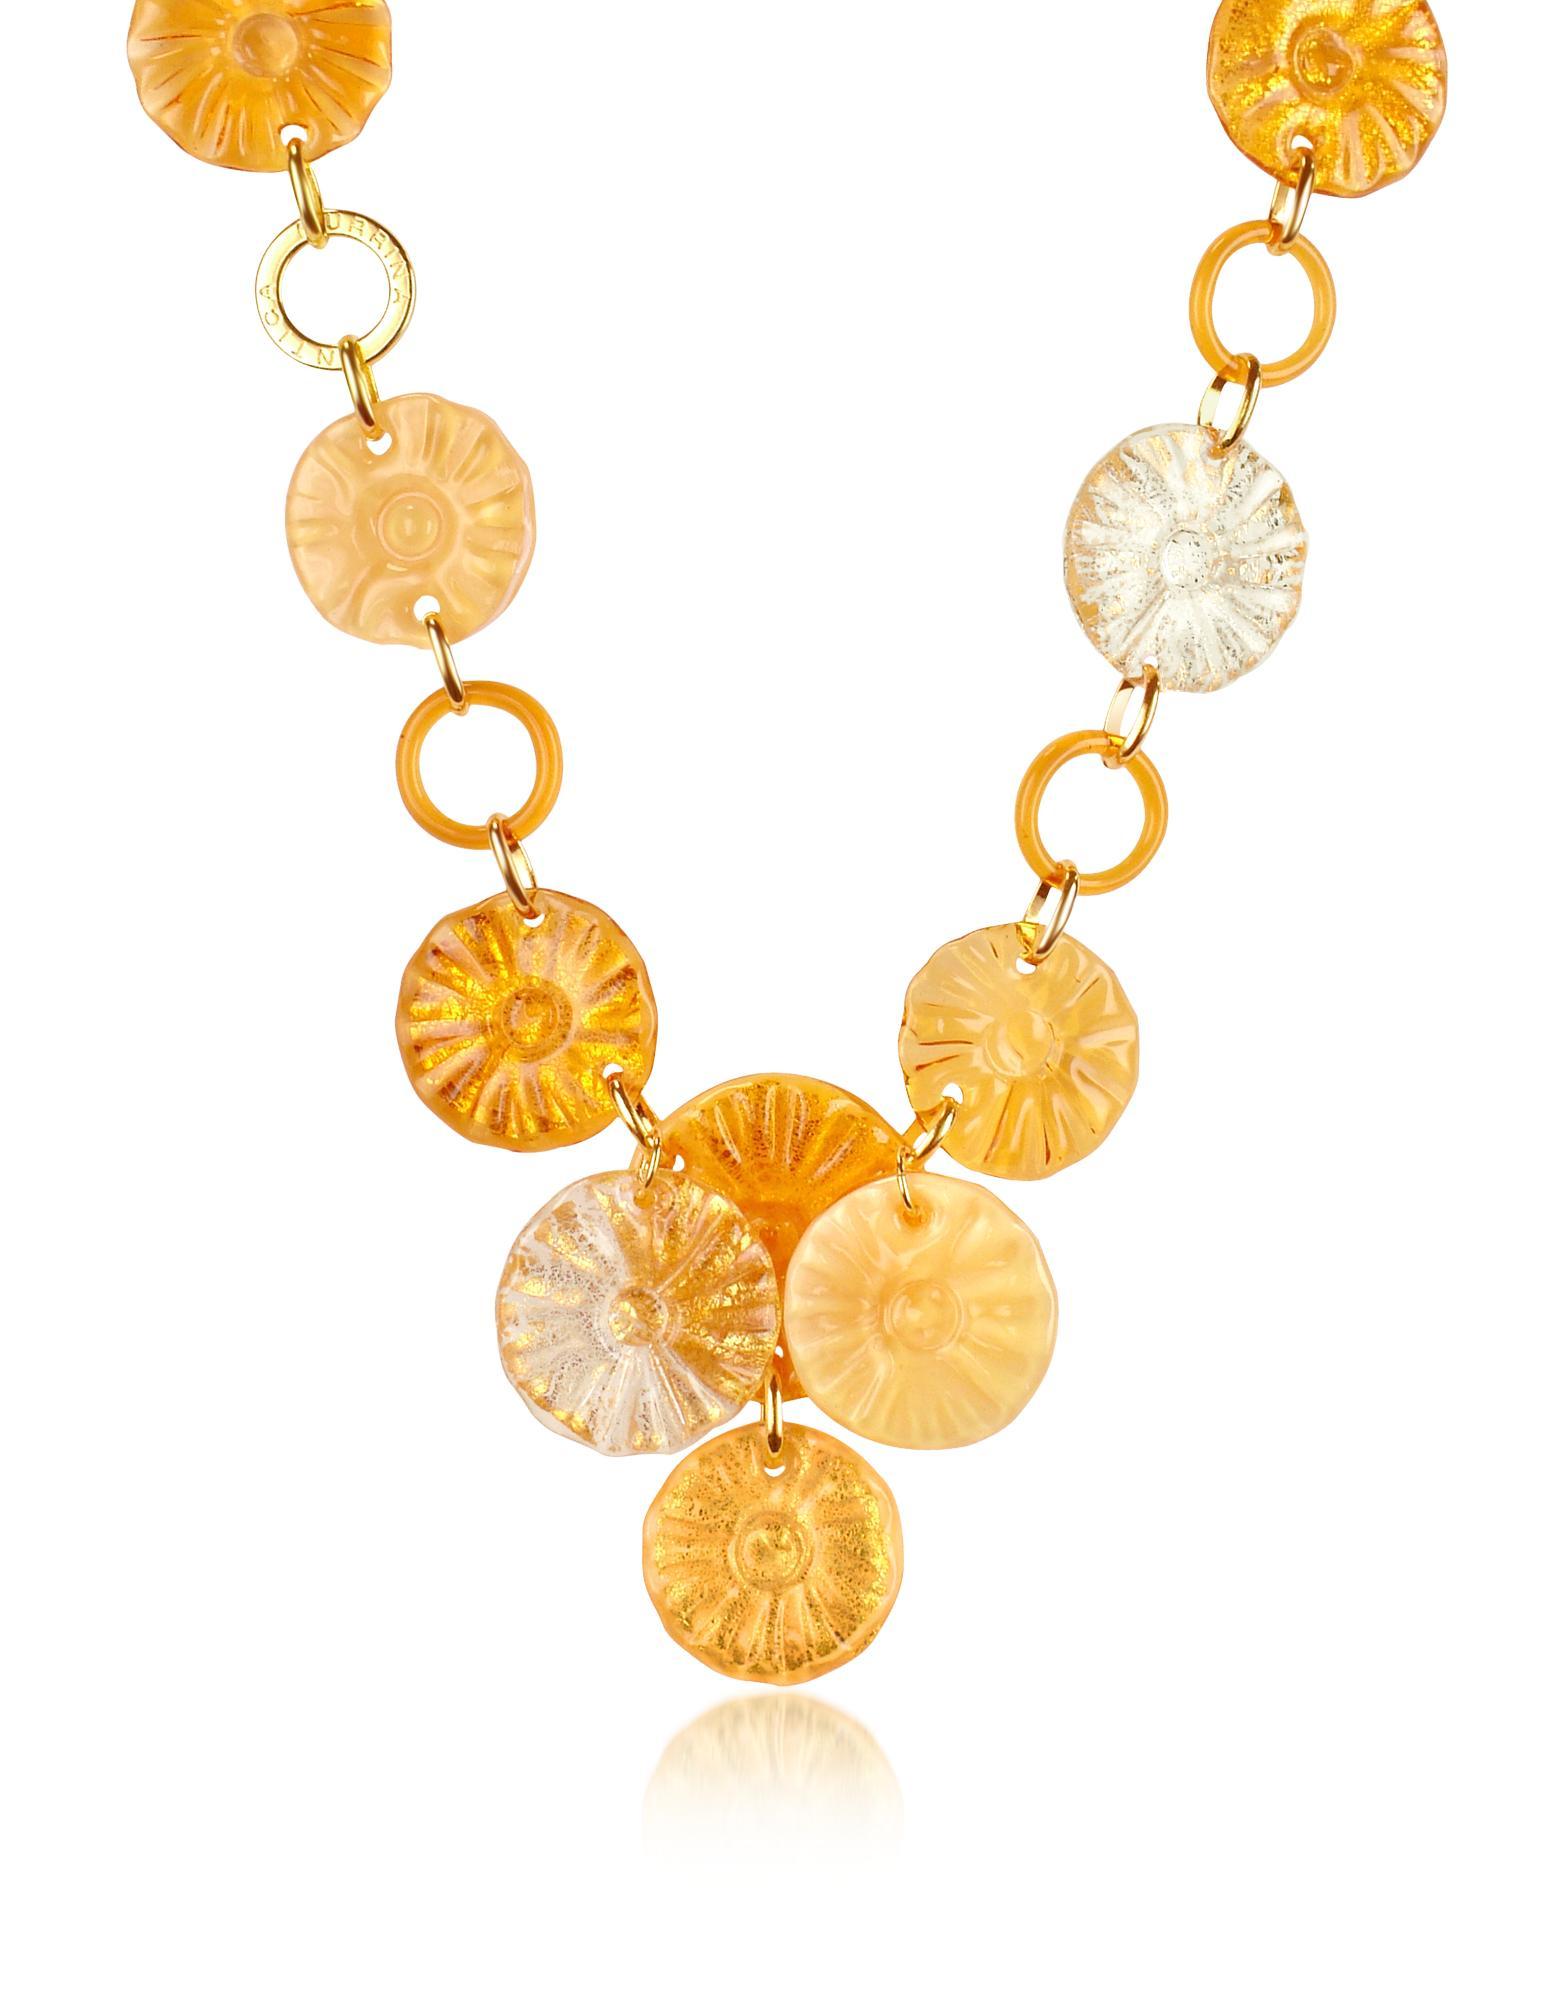 Antica Murrina Joy - Murano Glass Flower Drop Necklace